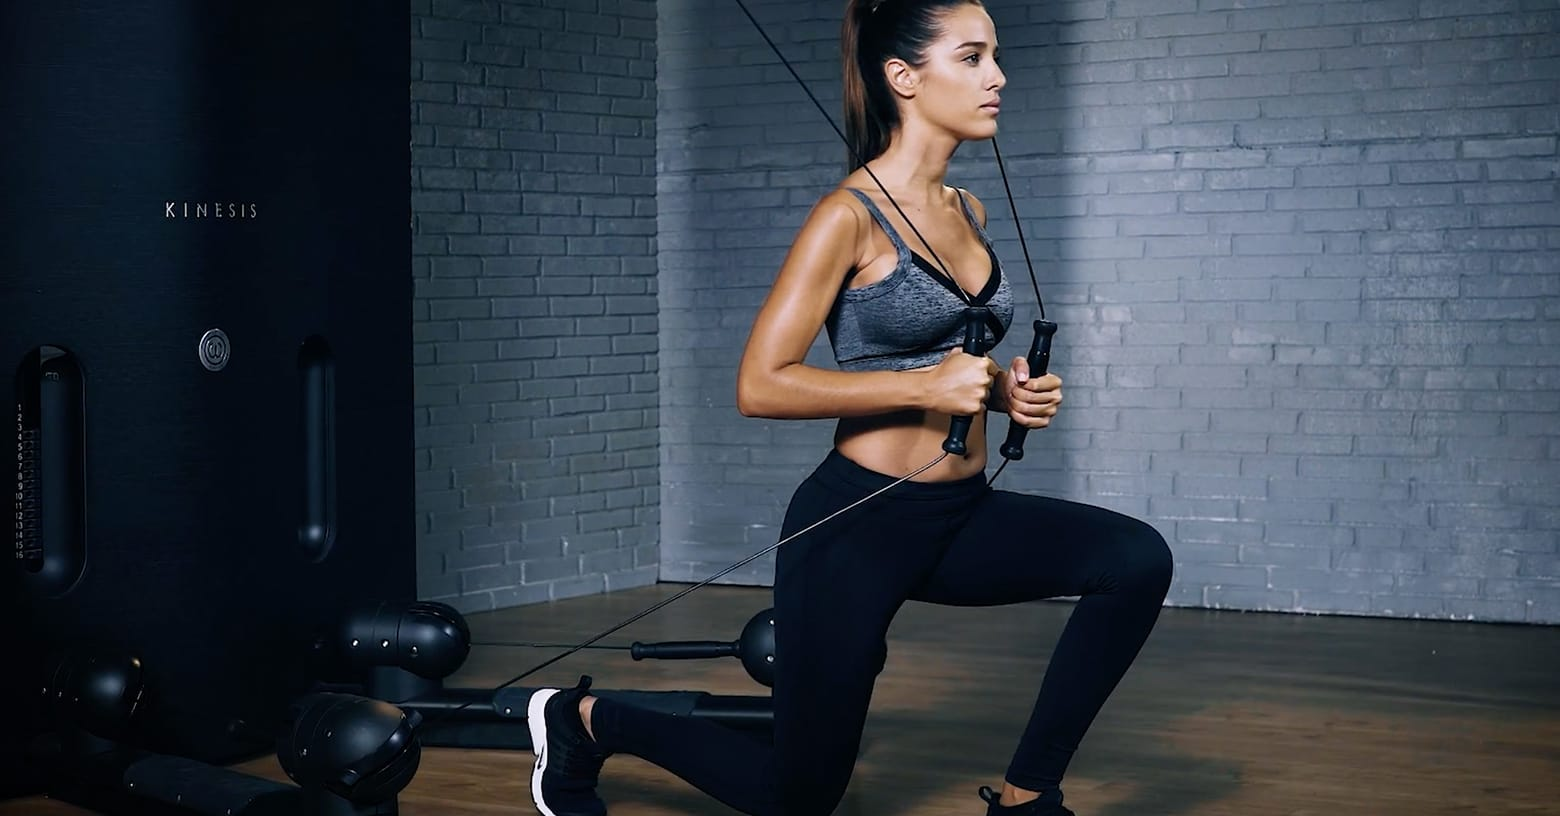 Kinesis lunge - Kinesis Ausfallschritt - Fente kinesis - EVO Fitness